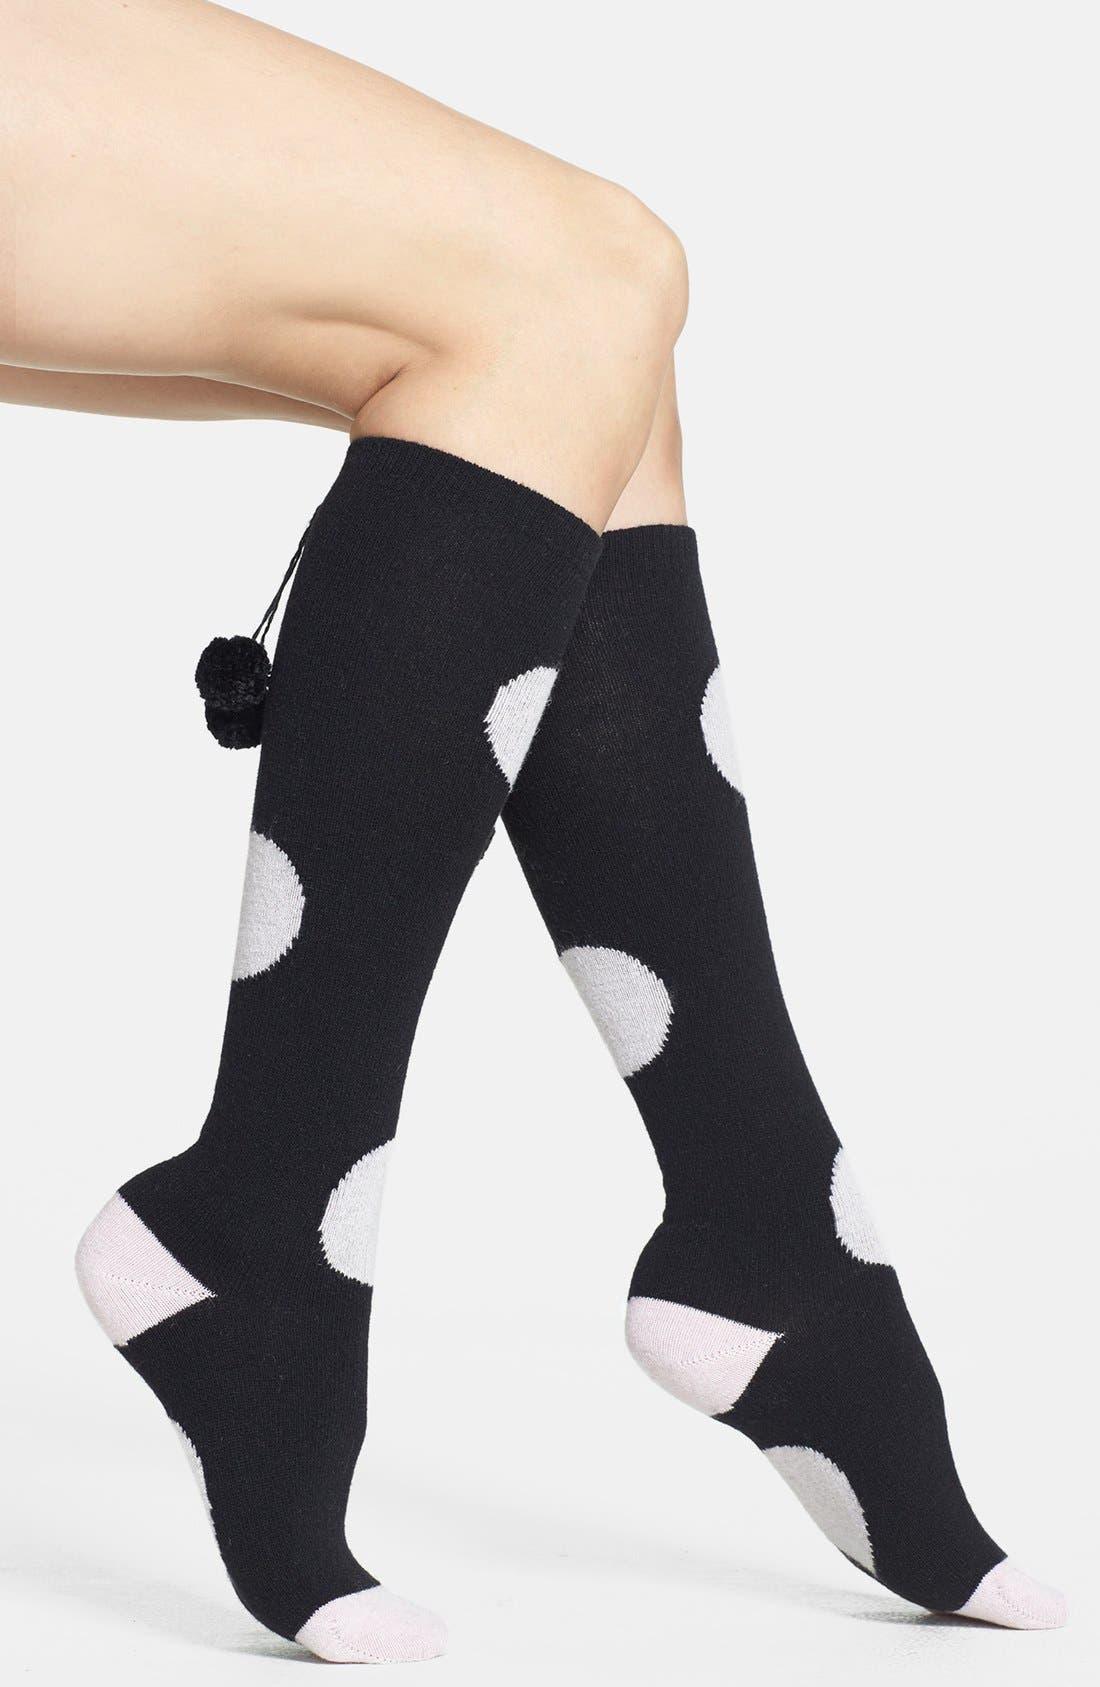 Alternate Image 1 Selected - kate spade new york 'holiday - big spot' pompom knee high socks